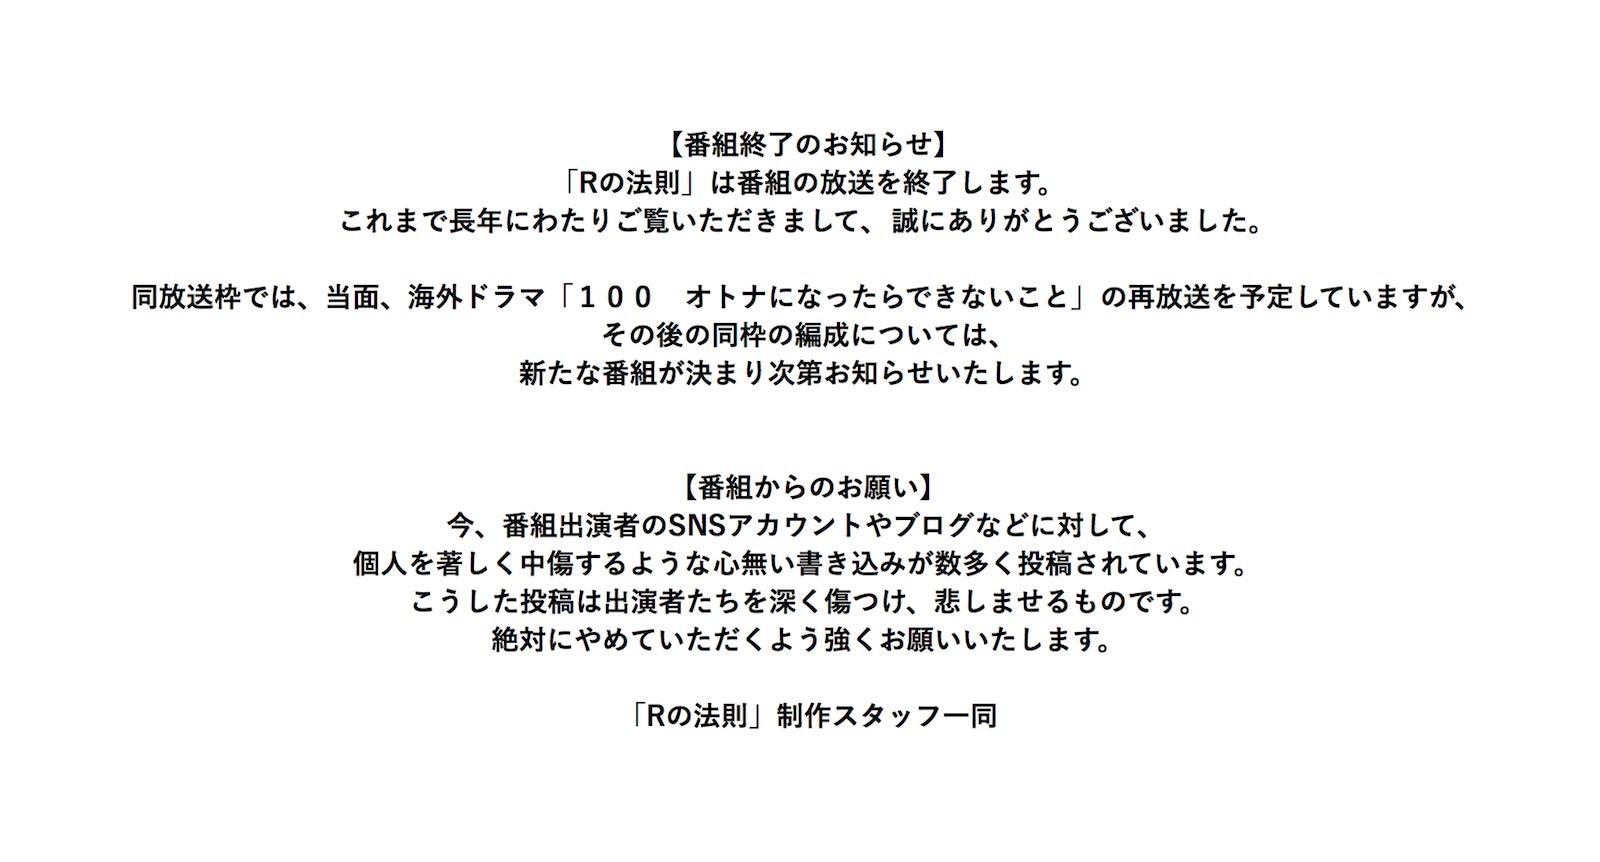 NHK Eテレ「Rの法則」公式ホームページ